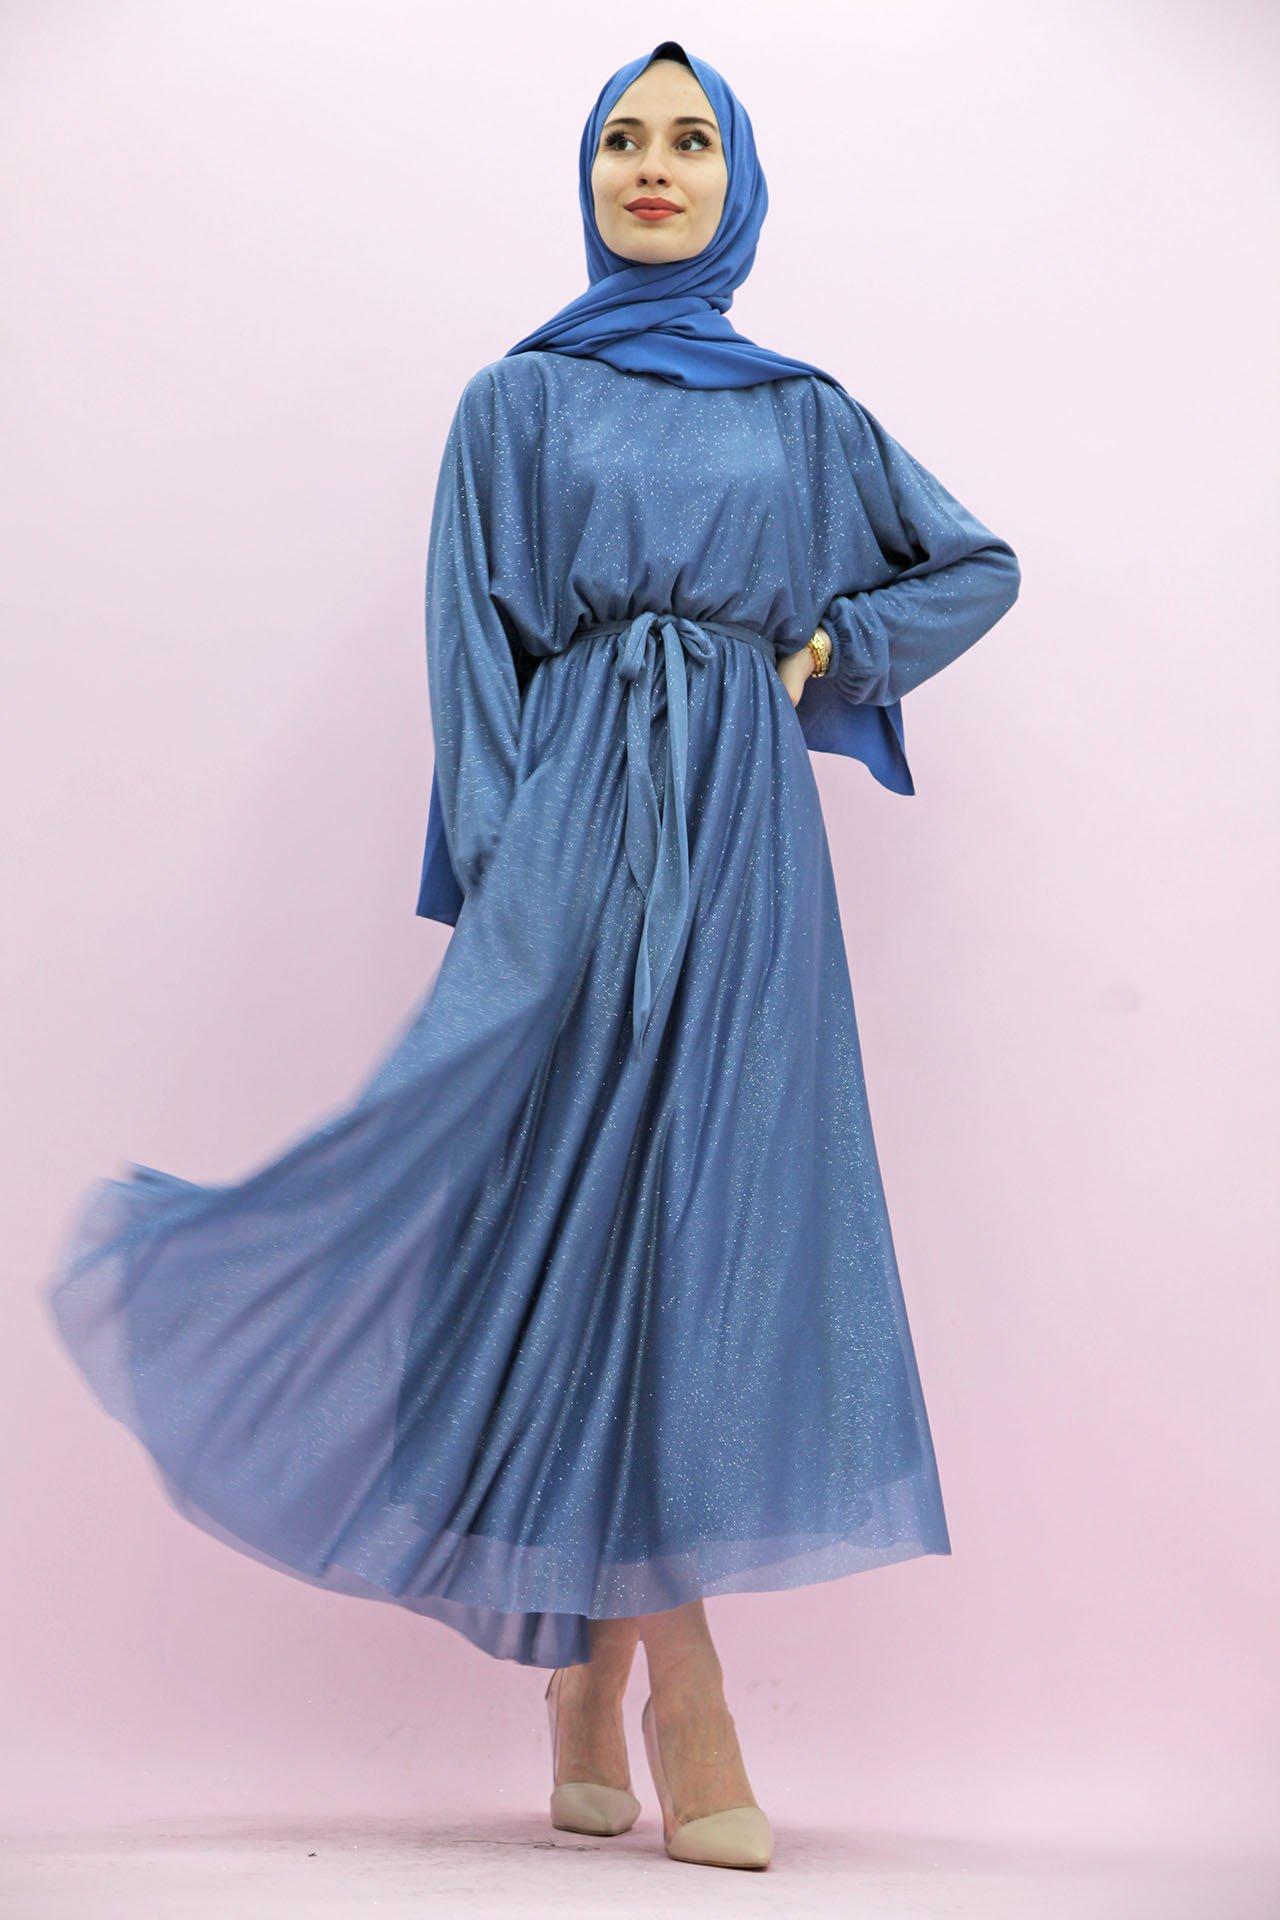 GİZAGİYİM - Simli Şifon Elbise İndigo